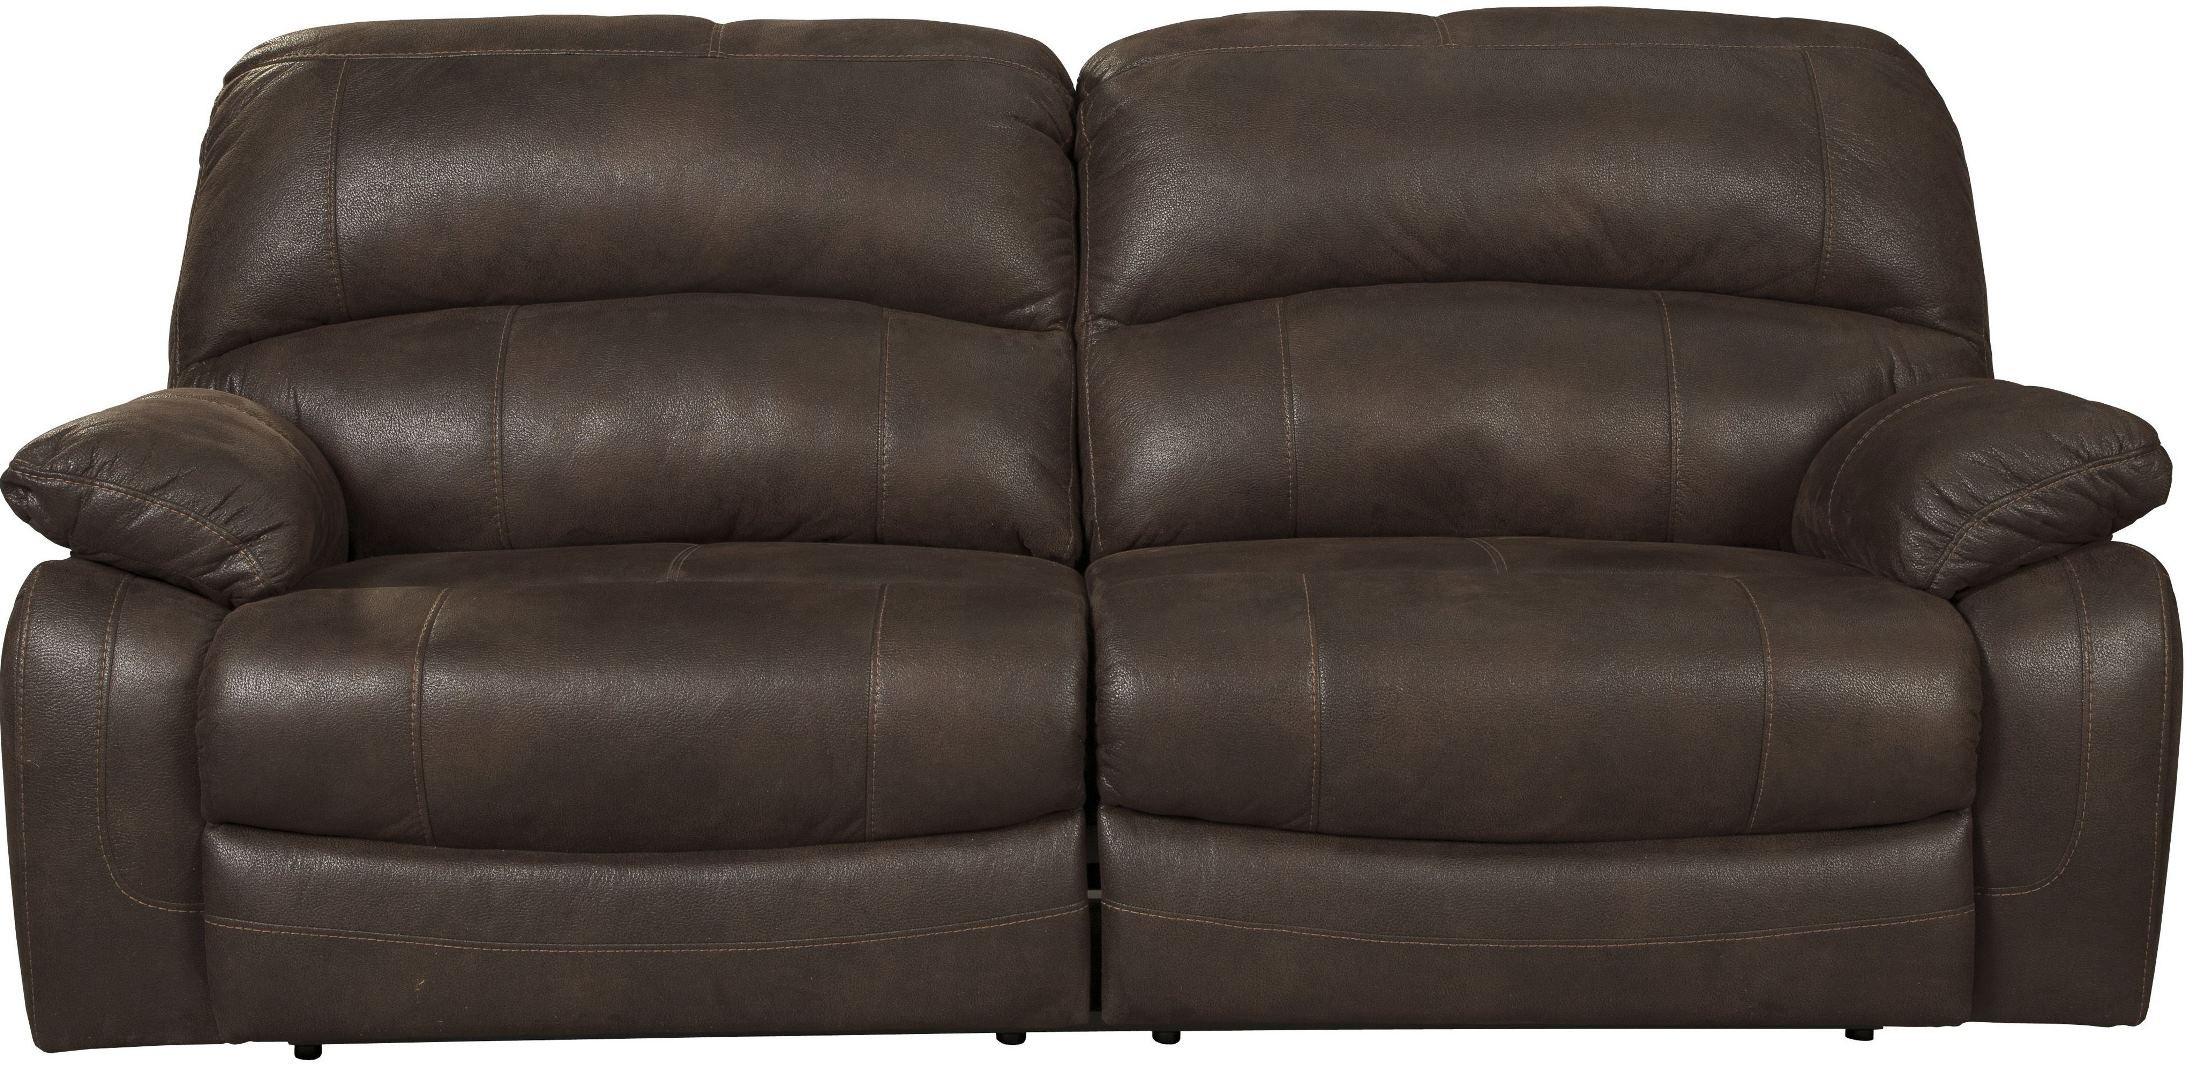 Zavier Truffle 2 Seat Power Reclining Sofa From Ashley 4290147  ~ Two Cushion Reclining Sofa